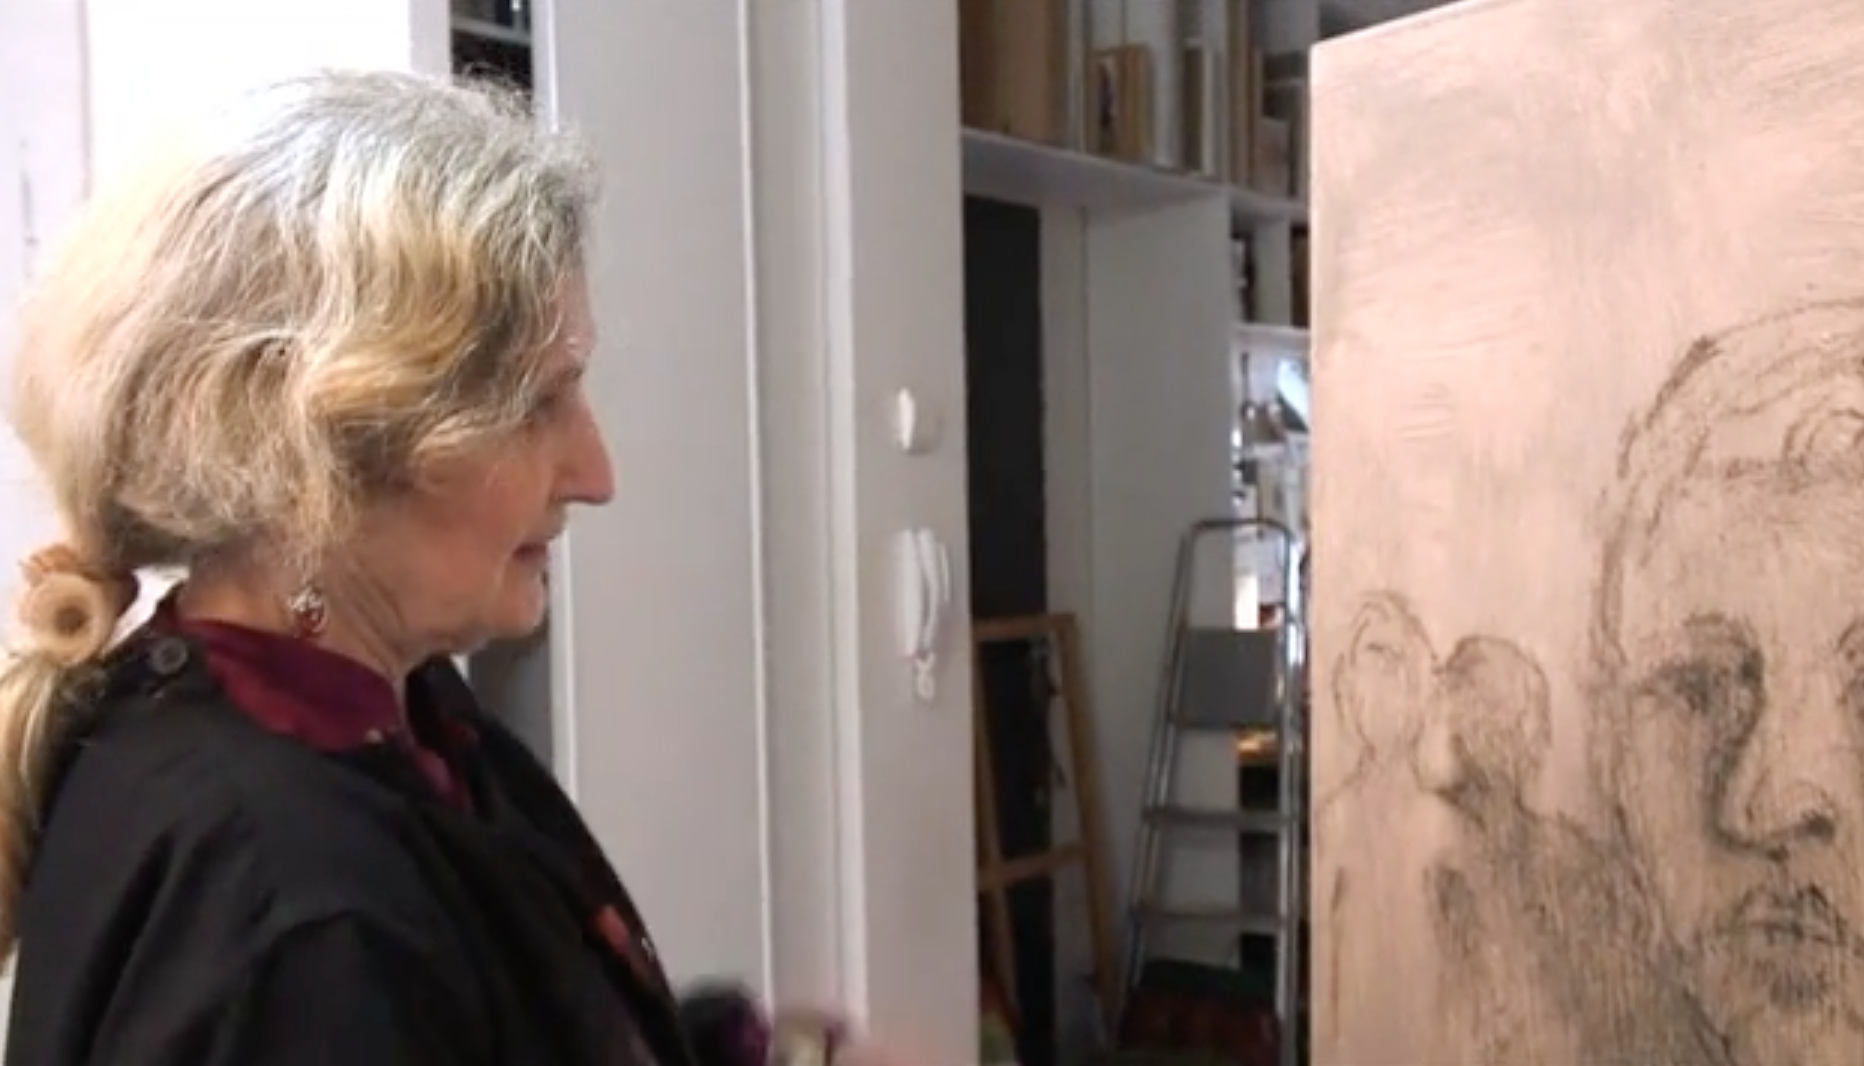 Elisabeth Walcker, Dessin peinture (capture d'écran), vidéo